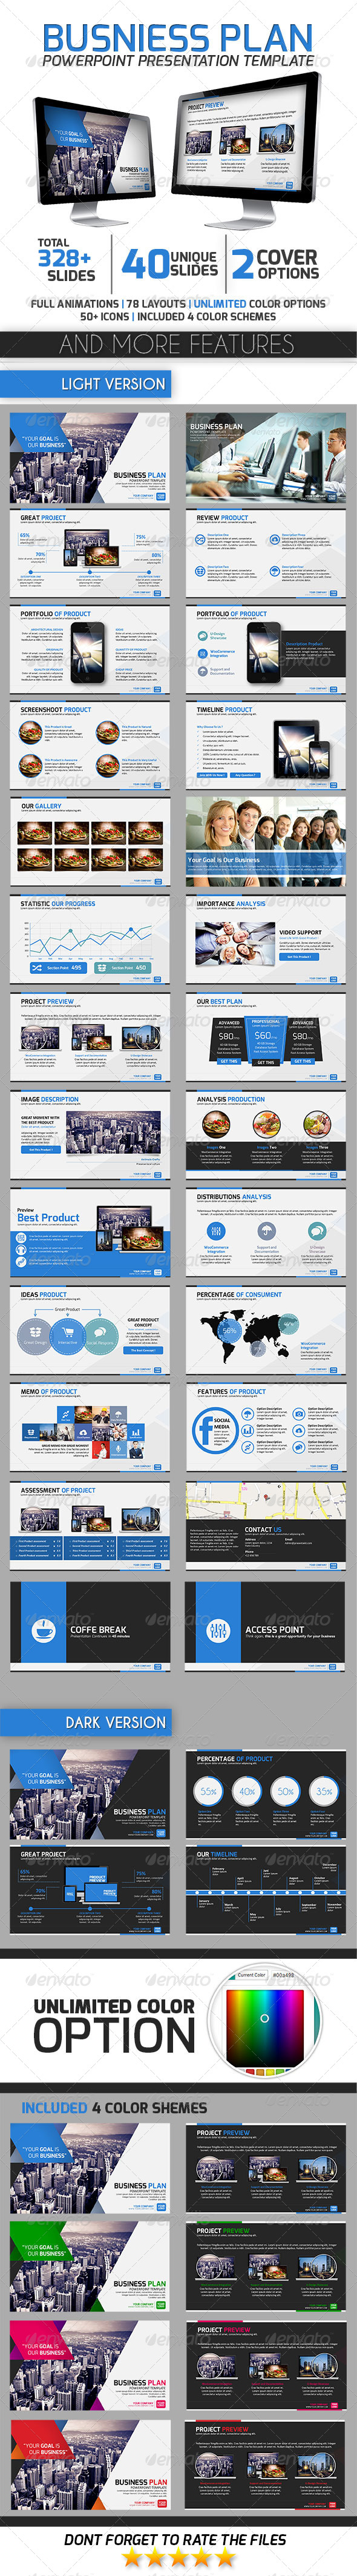 GraphicRiver Business Plan 7812485